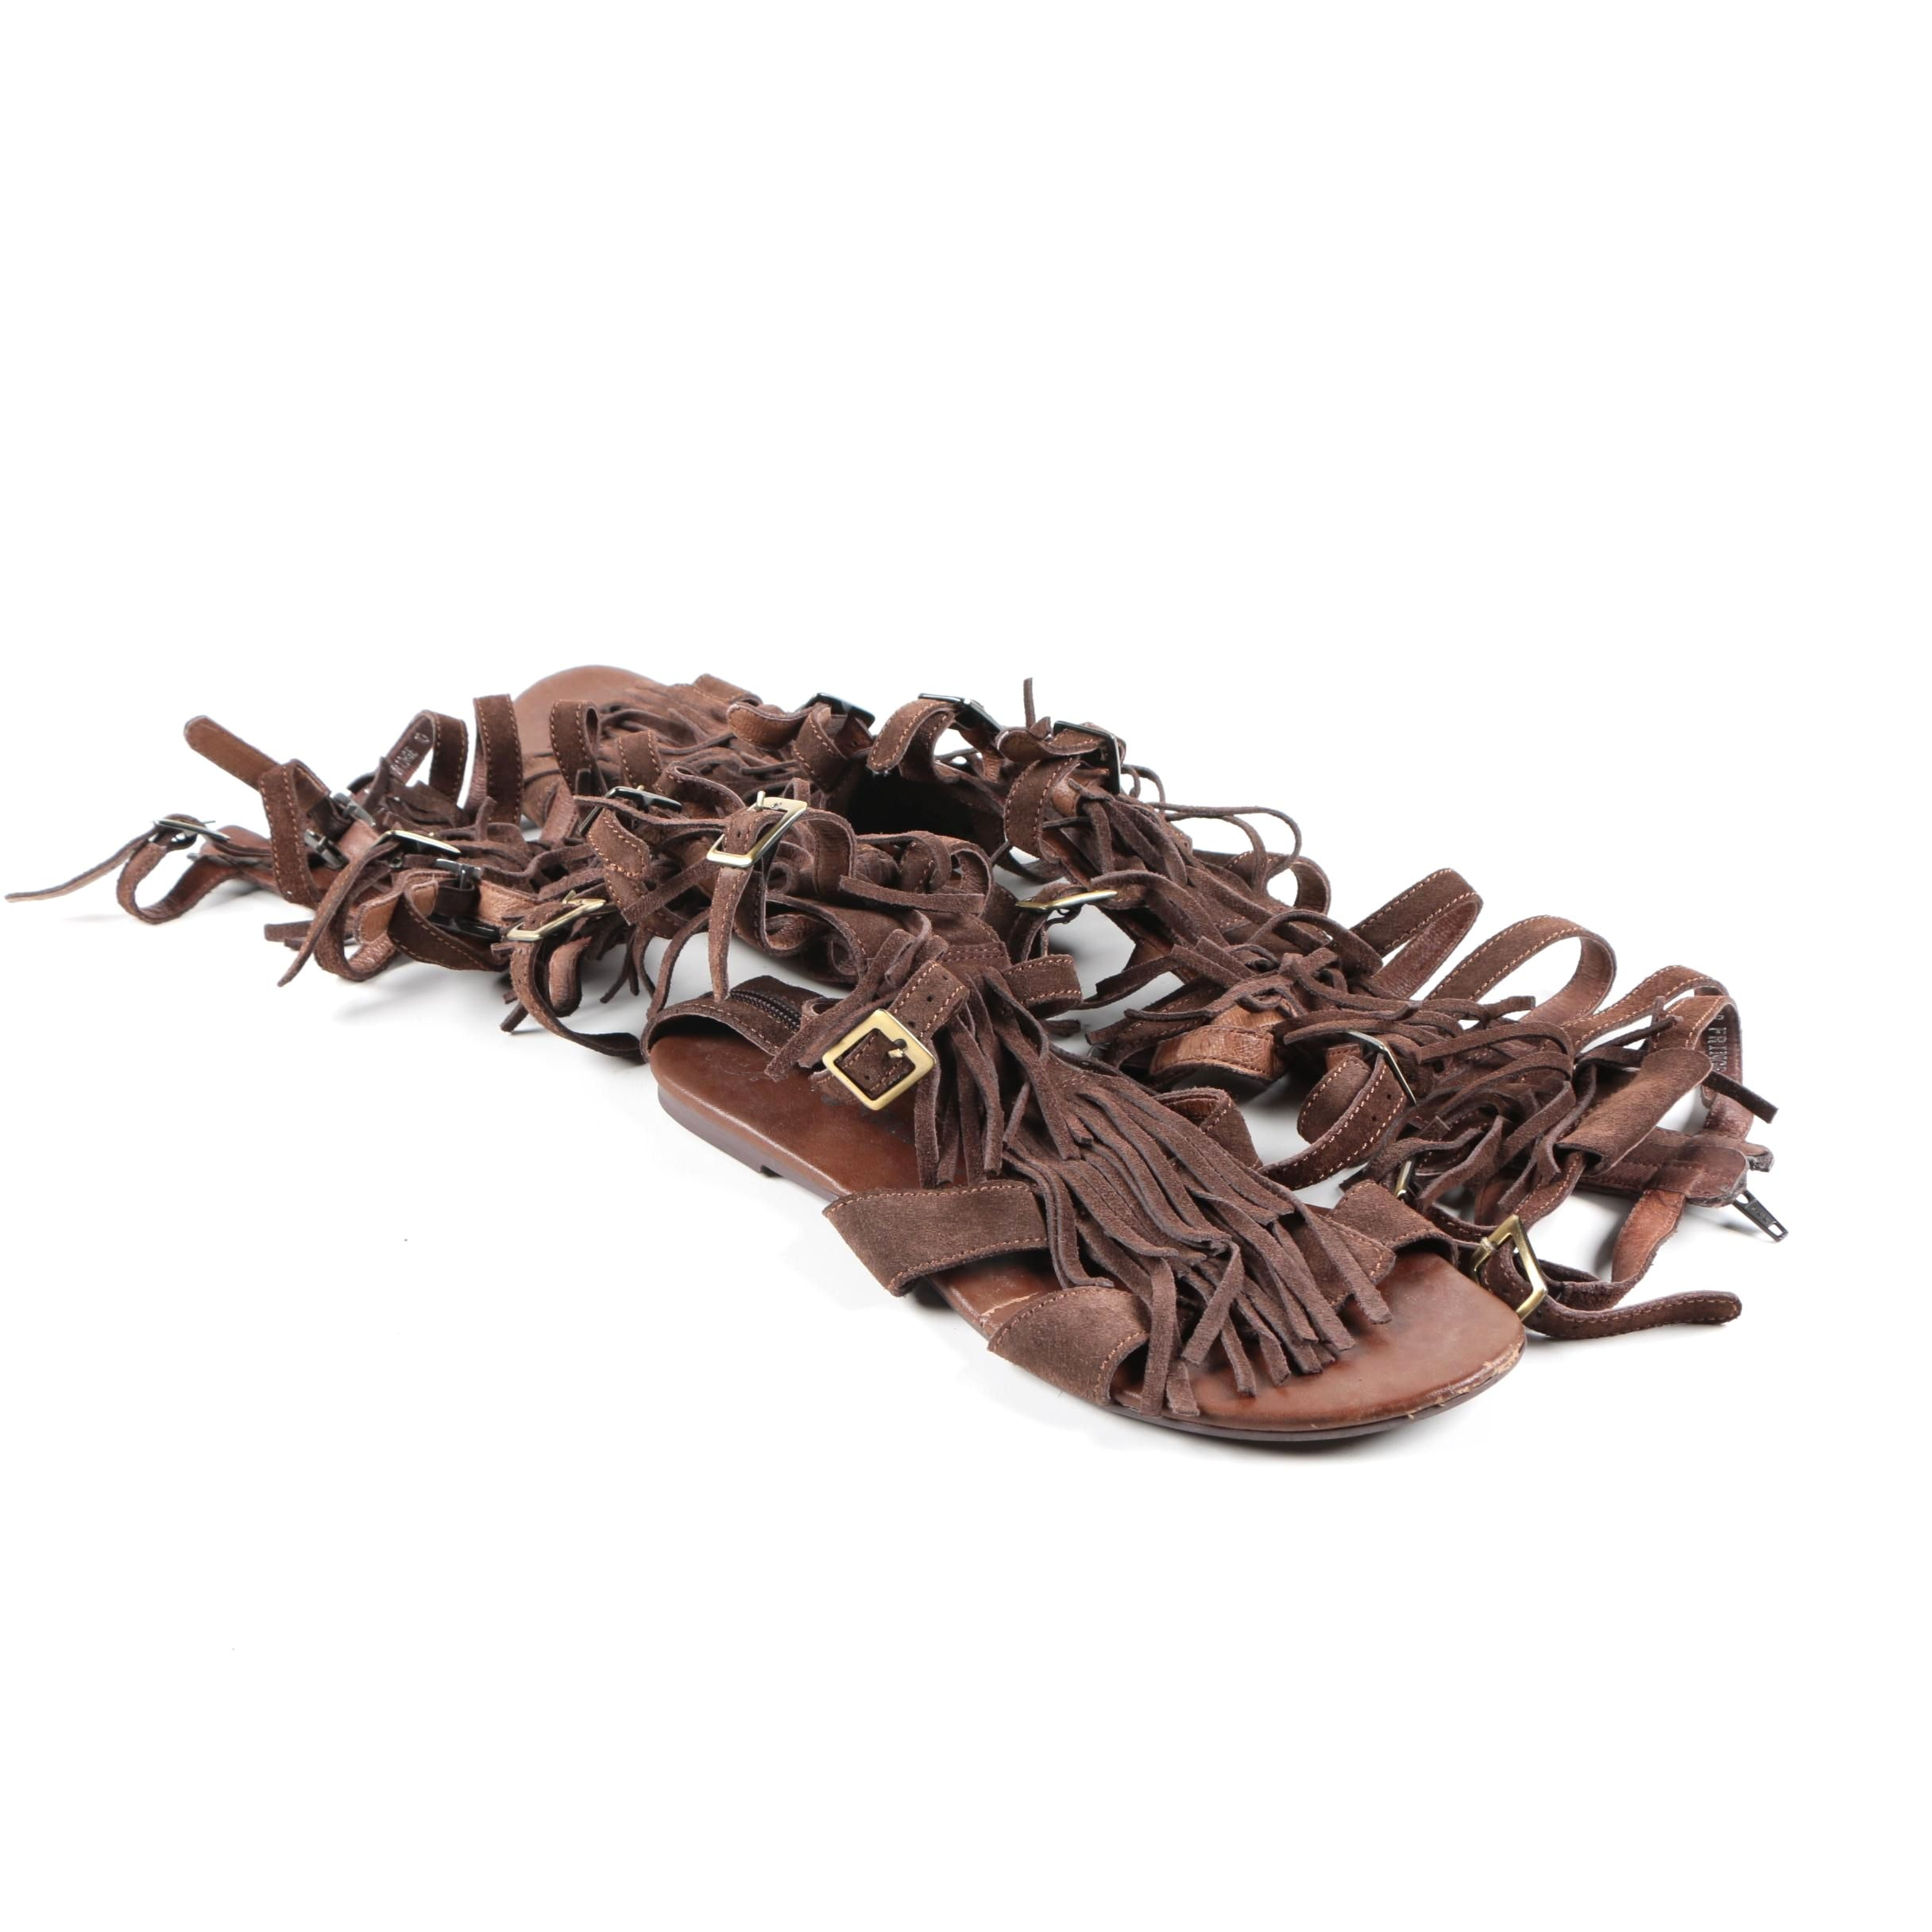 "Jeffrey Campbell ""Pampa"" Gladiator Sandals"